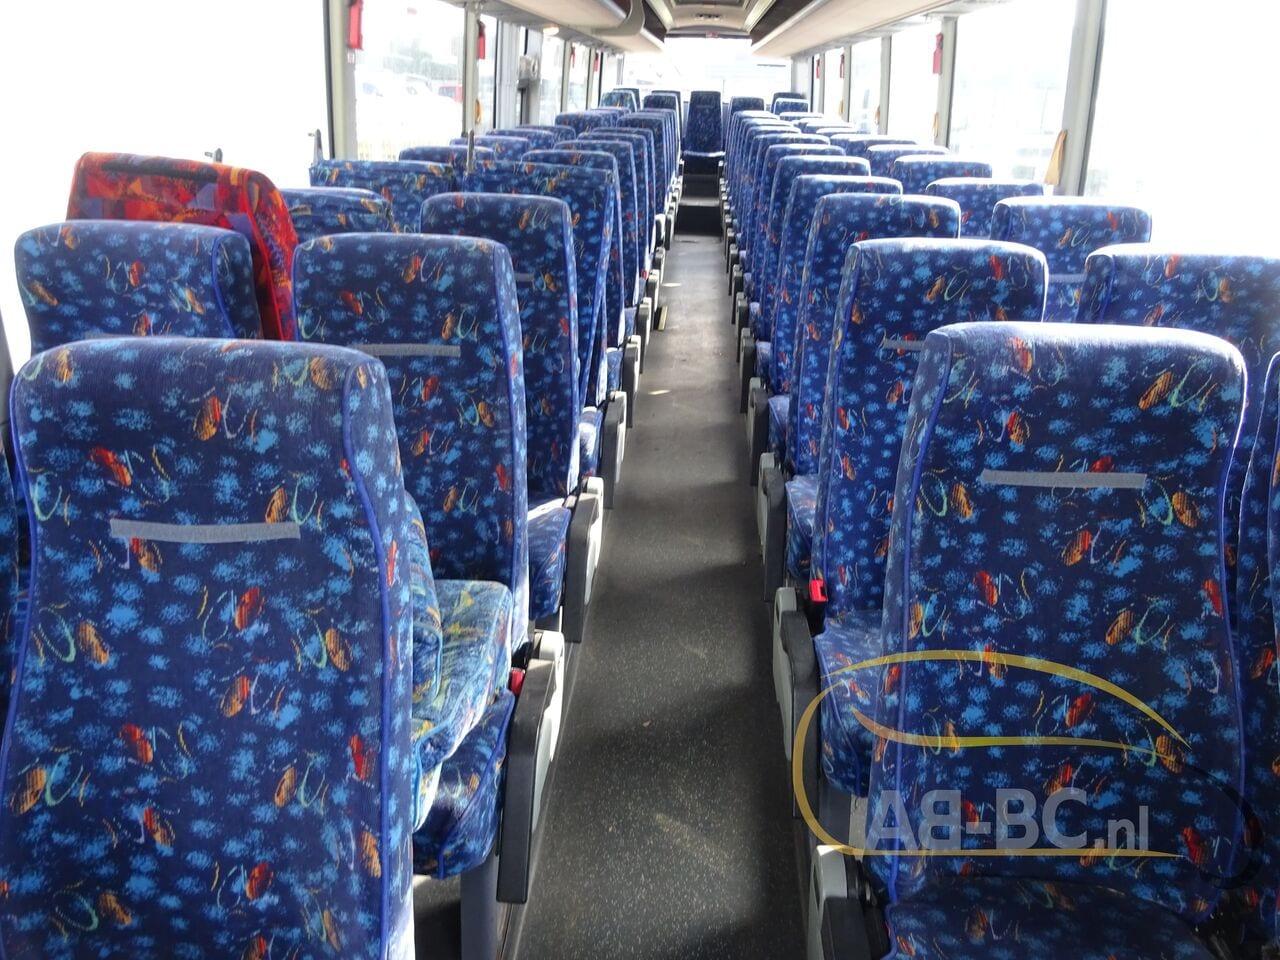 coach-busTEMSA-Safari-RD-65-Seats---1620311969739734324_big_11ea0bf80a5138cbce409fe6fba6ae3e--21050617272795316700